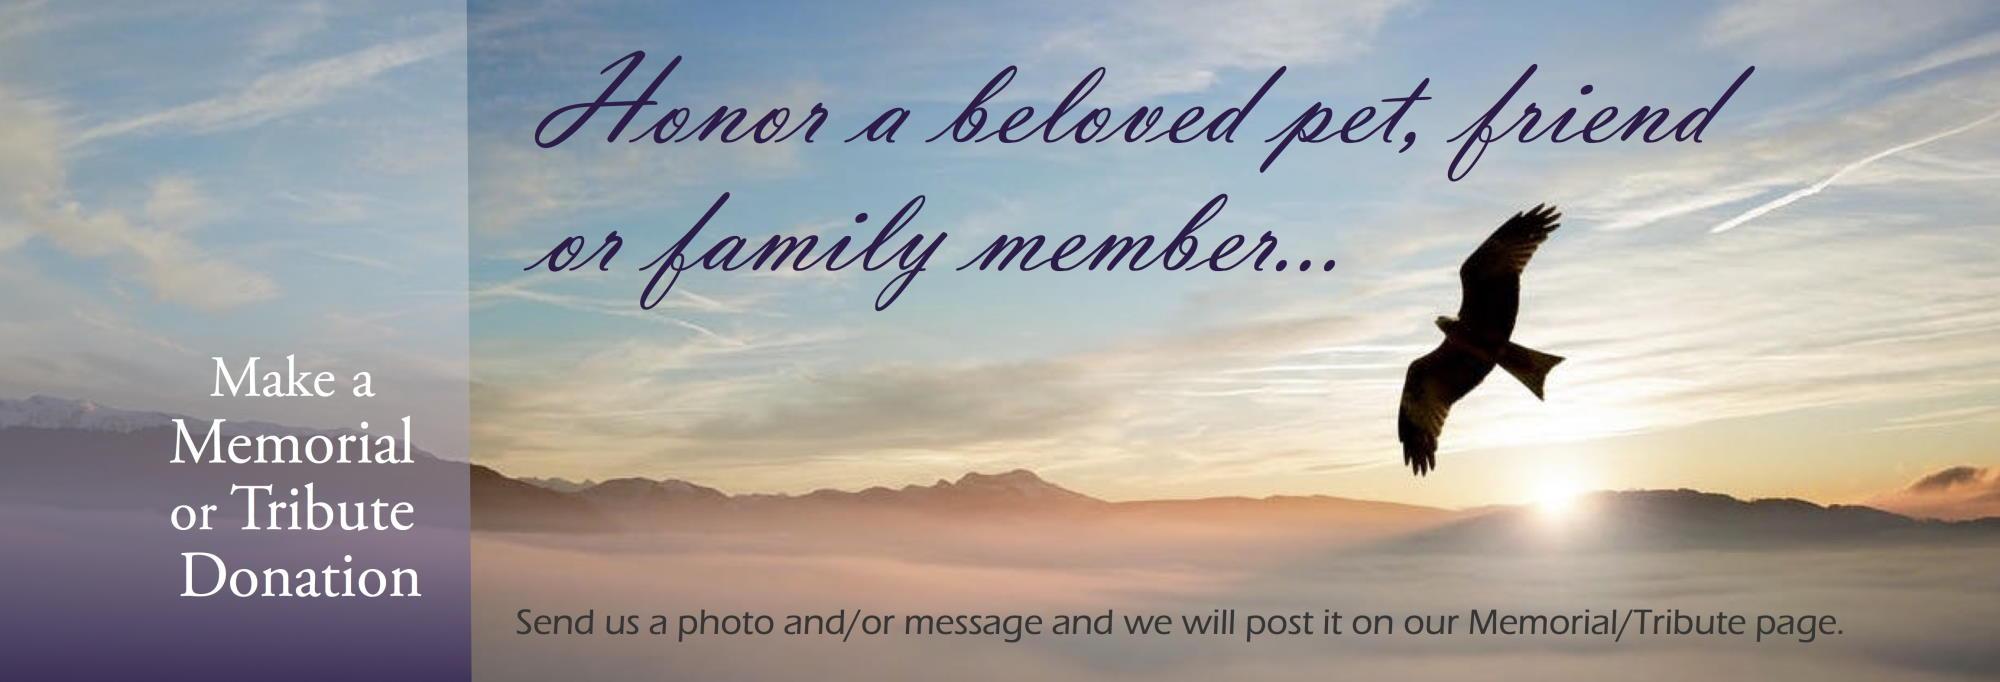 JCAPL Memorial / Tribute page